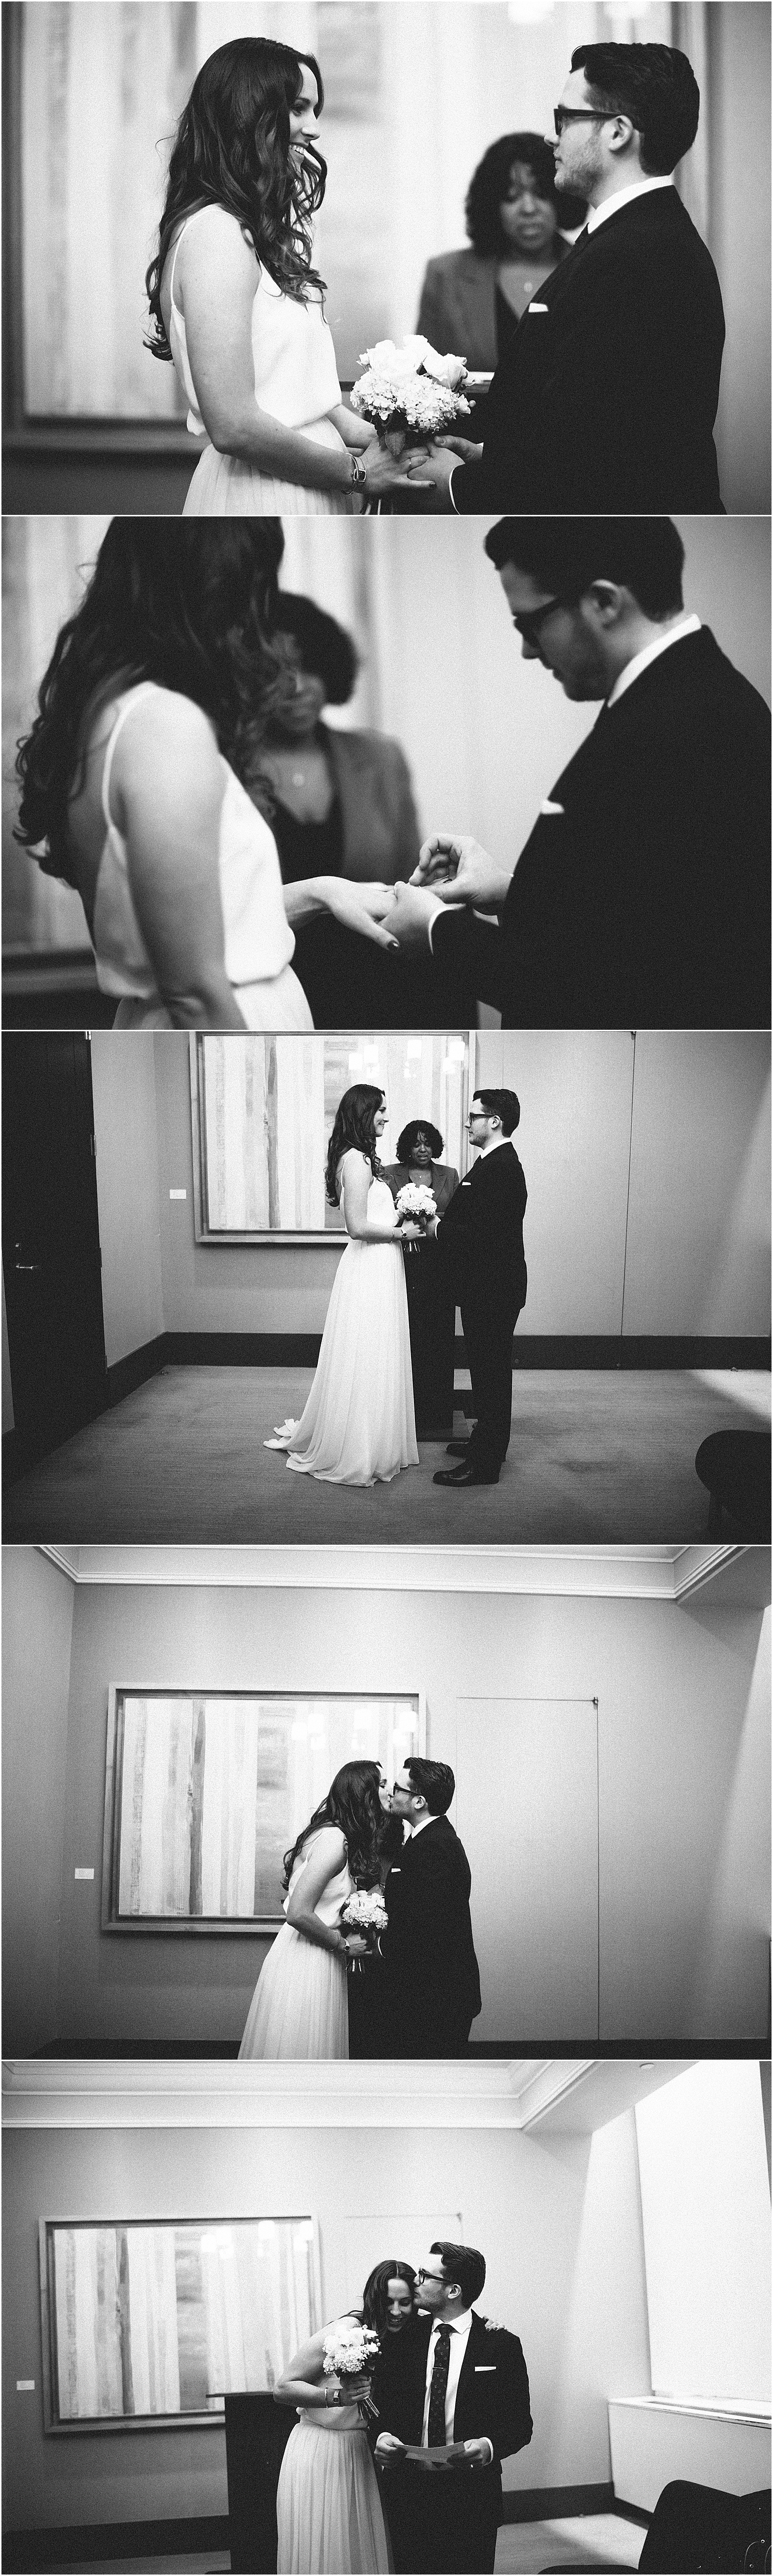 manzanita photo by rebecca caridad internation wedding photogrpaher, colorado wedding photographer, nashville wedding photographer_0614.jpg